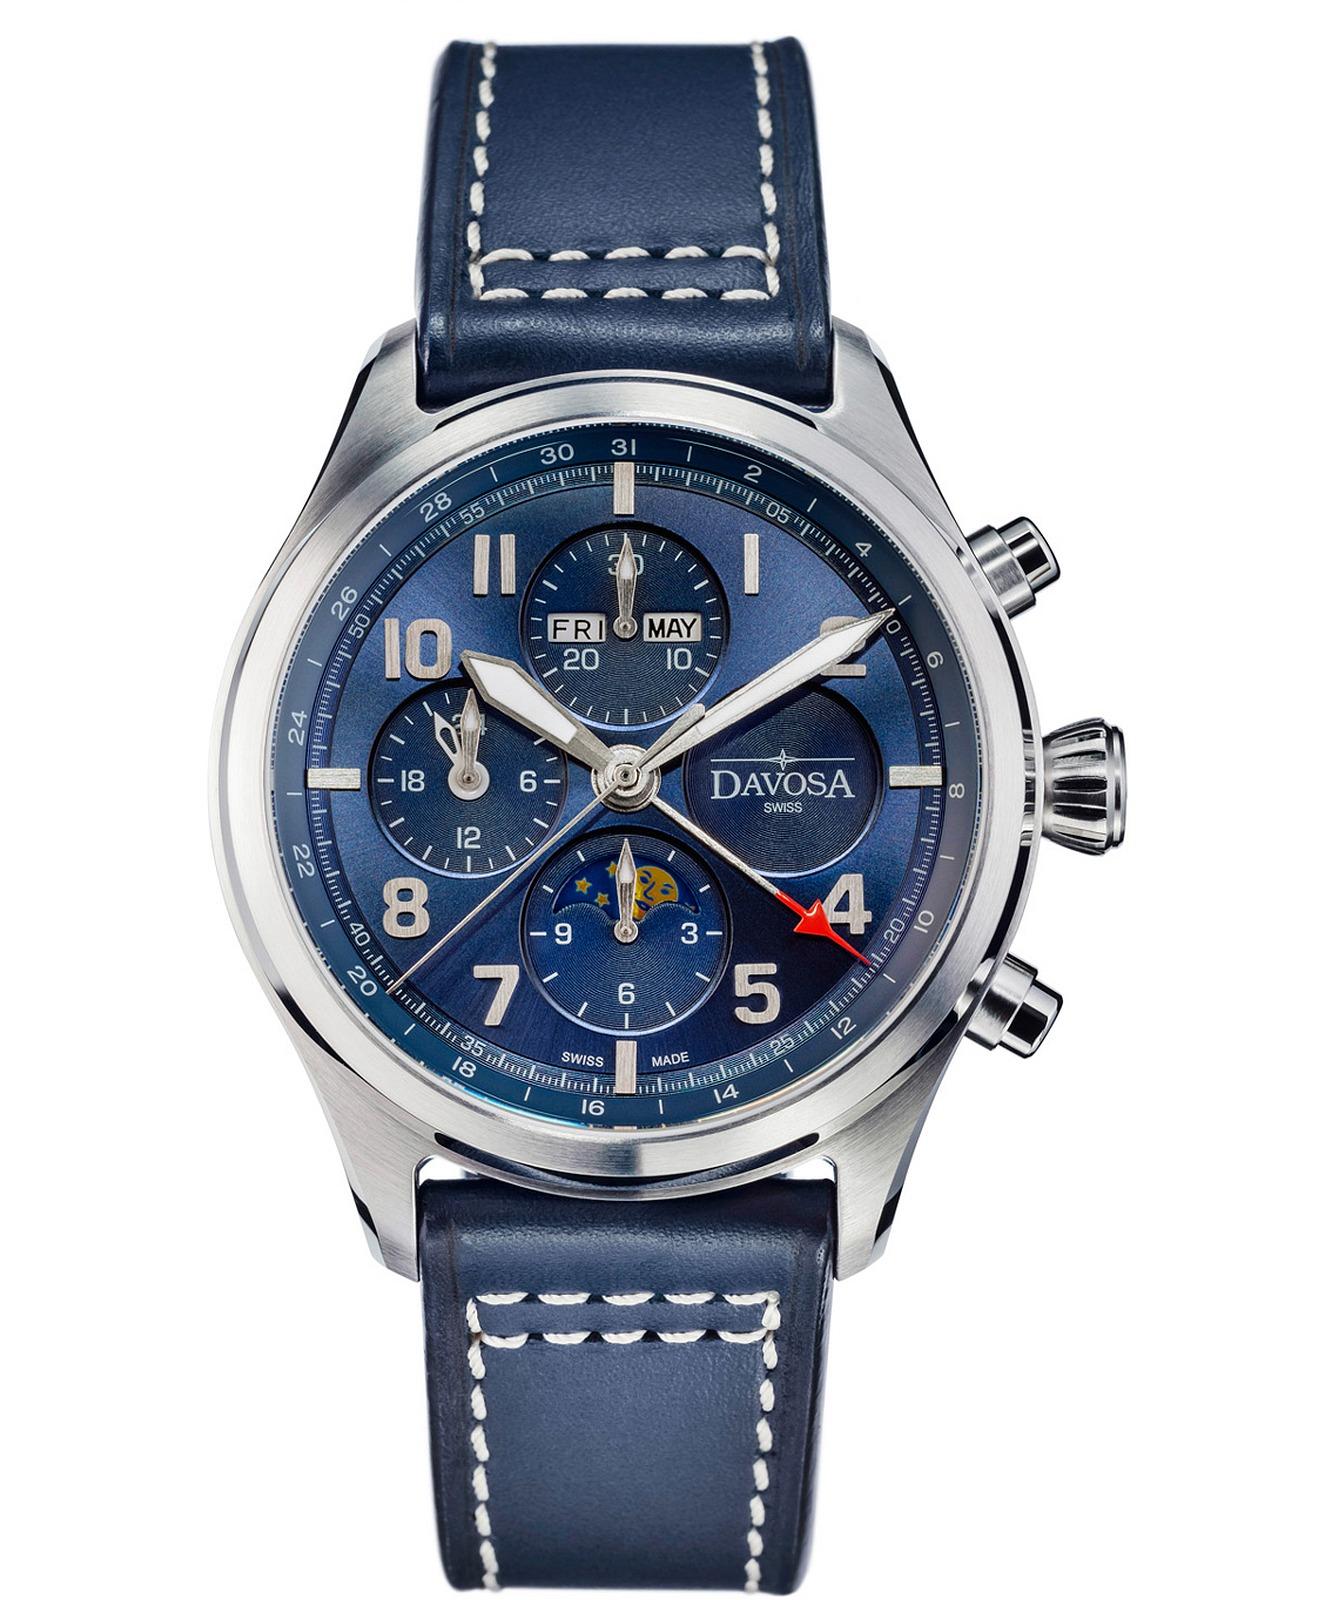 zegarek-meski-davosa-newton-pilot-moonphase-automatic-valjoux-chronograph-limited-161-586-45_001